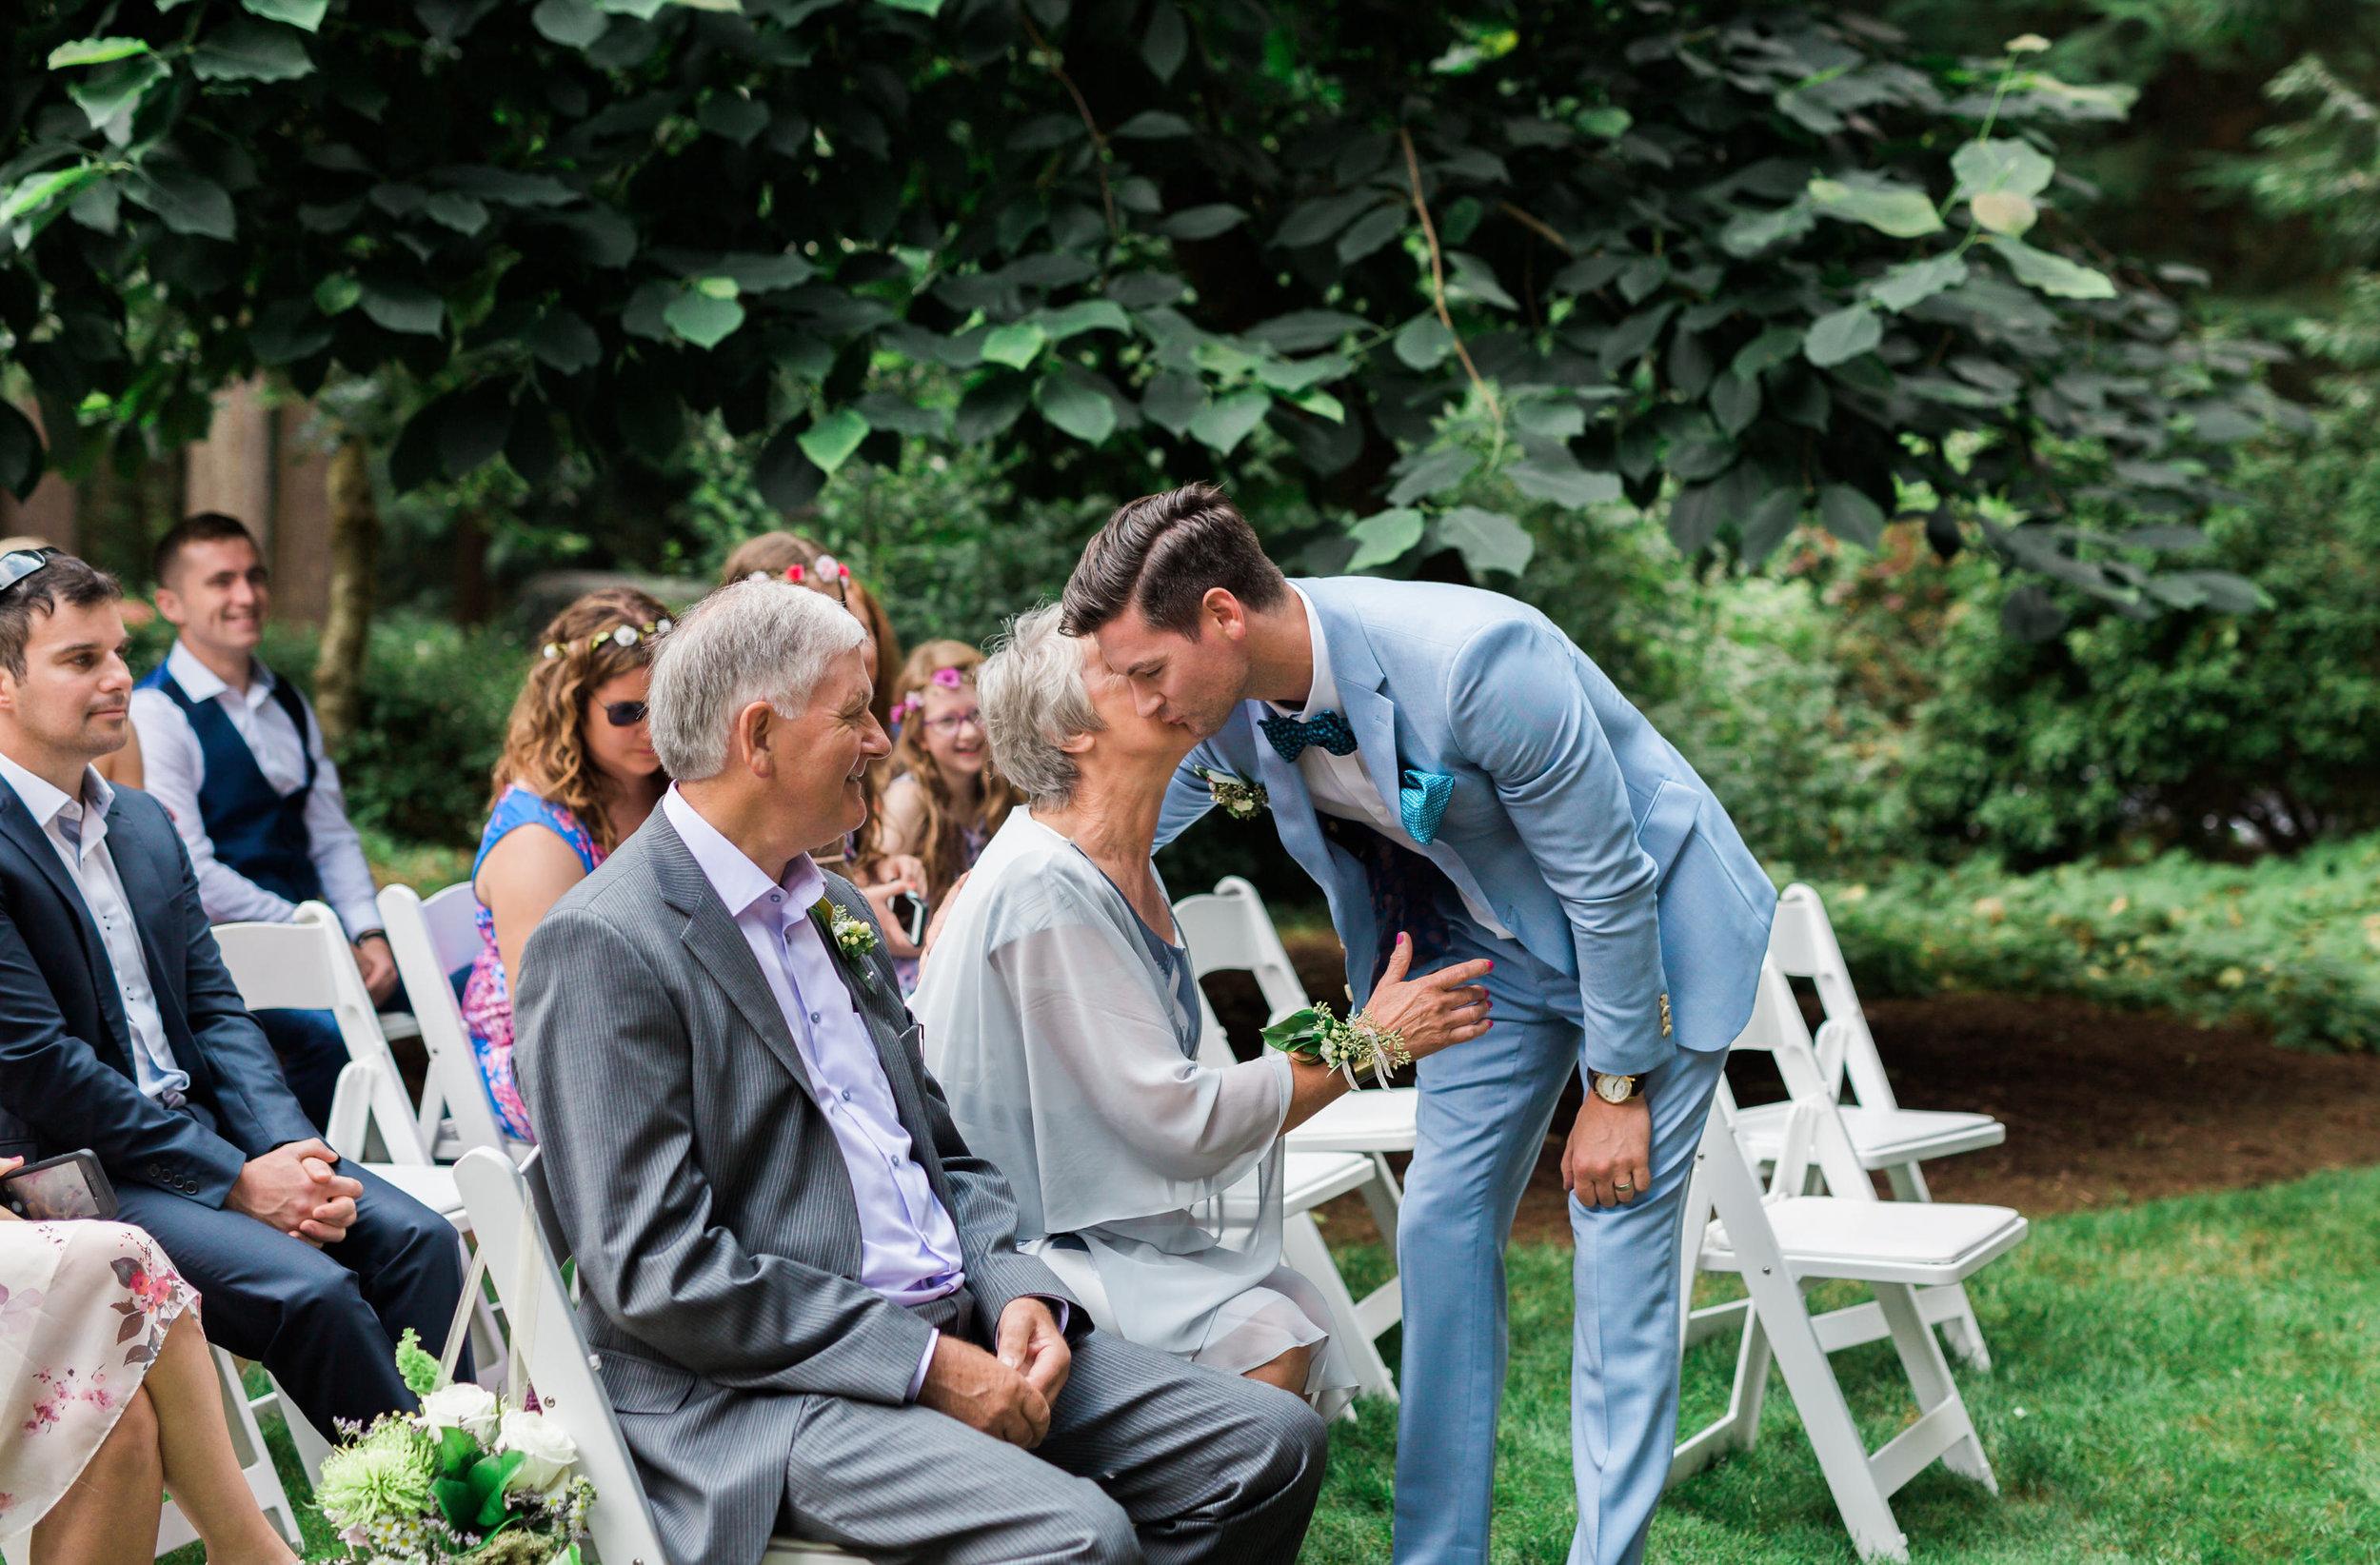 Linwood House Wedding Photos - Roberts Creek Wedding Photos - Vancouver Wedding Photographer & Videographer - Sunshine Coast Wedding Photos - Sunshine Coast Wedding Photographer - Jennifer Picard Photography - IMG_6443.jpg